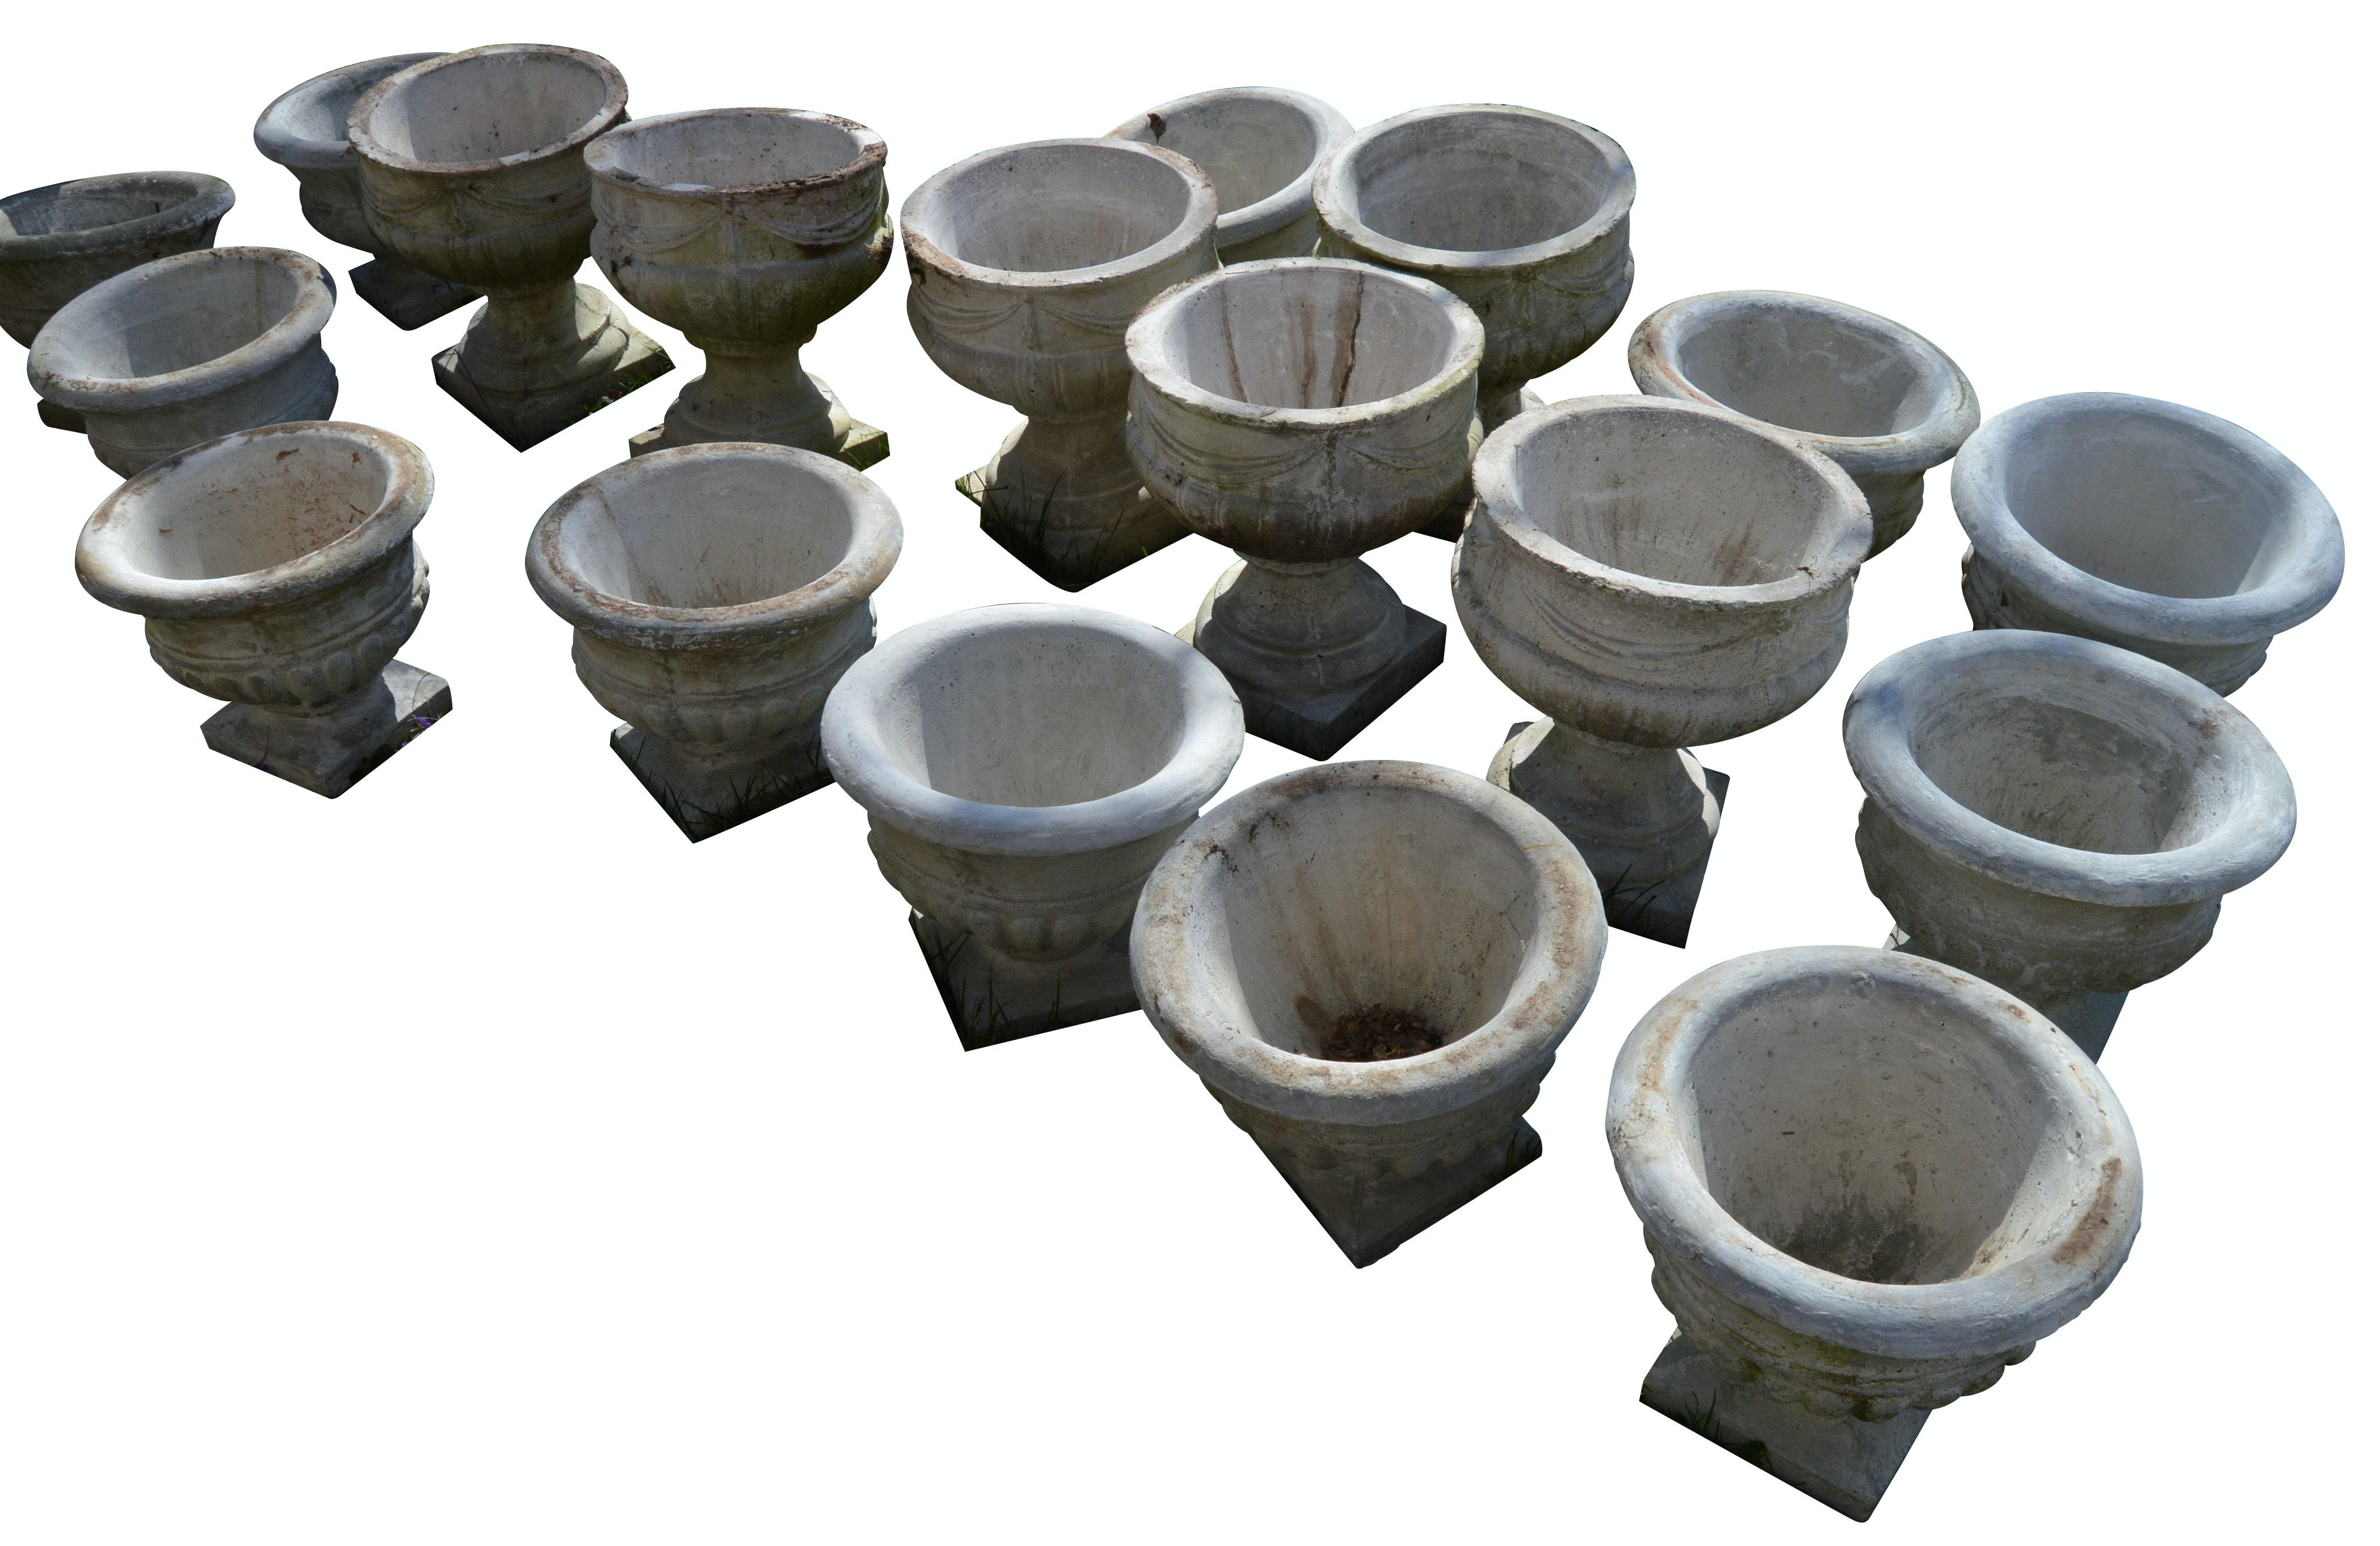 Large Assortment of Round Concrete Planters